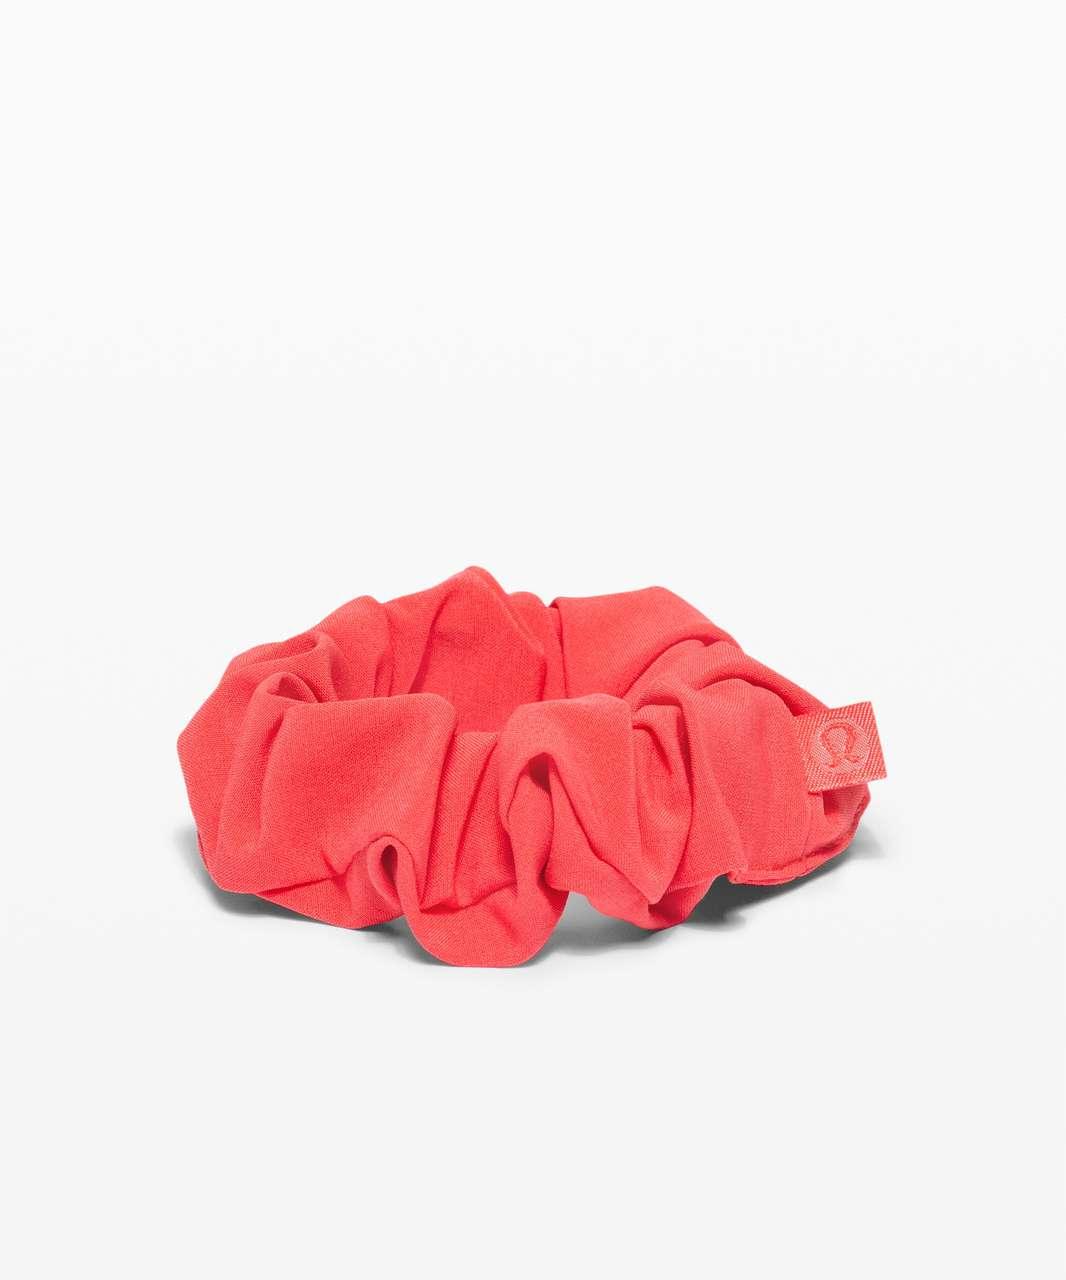 Lululemon Uplifting Scrunchie - Pink Punch